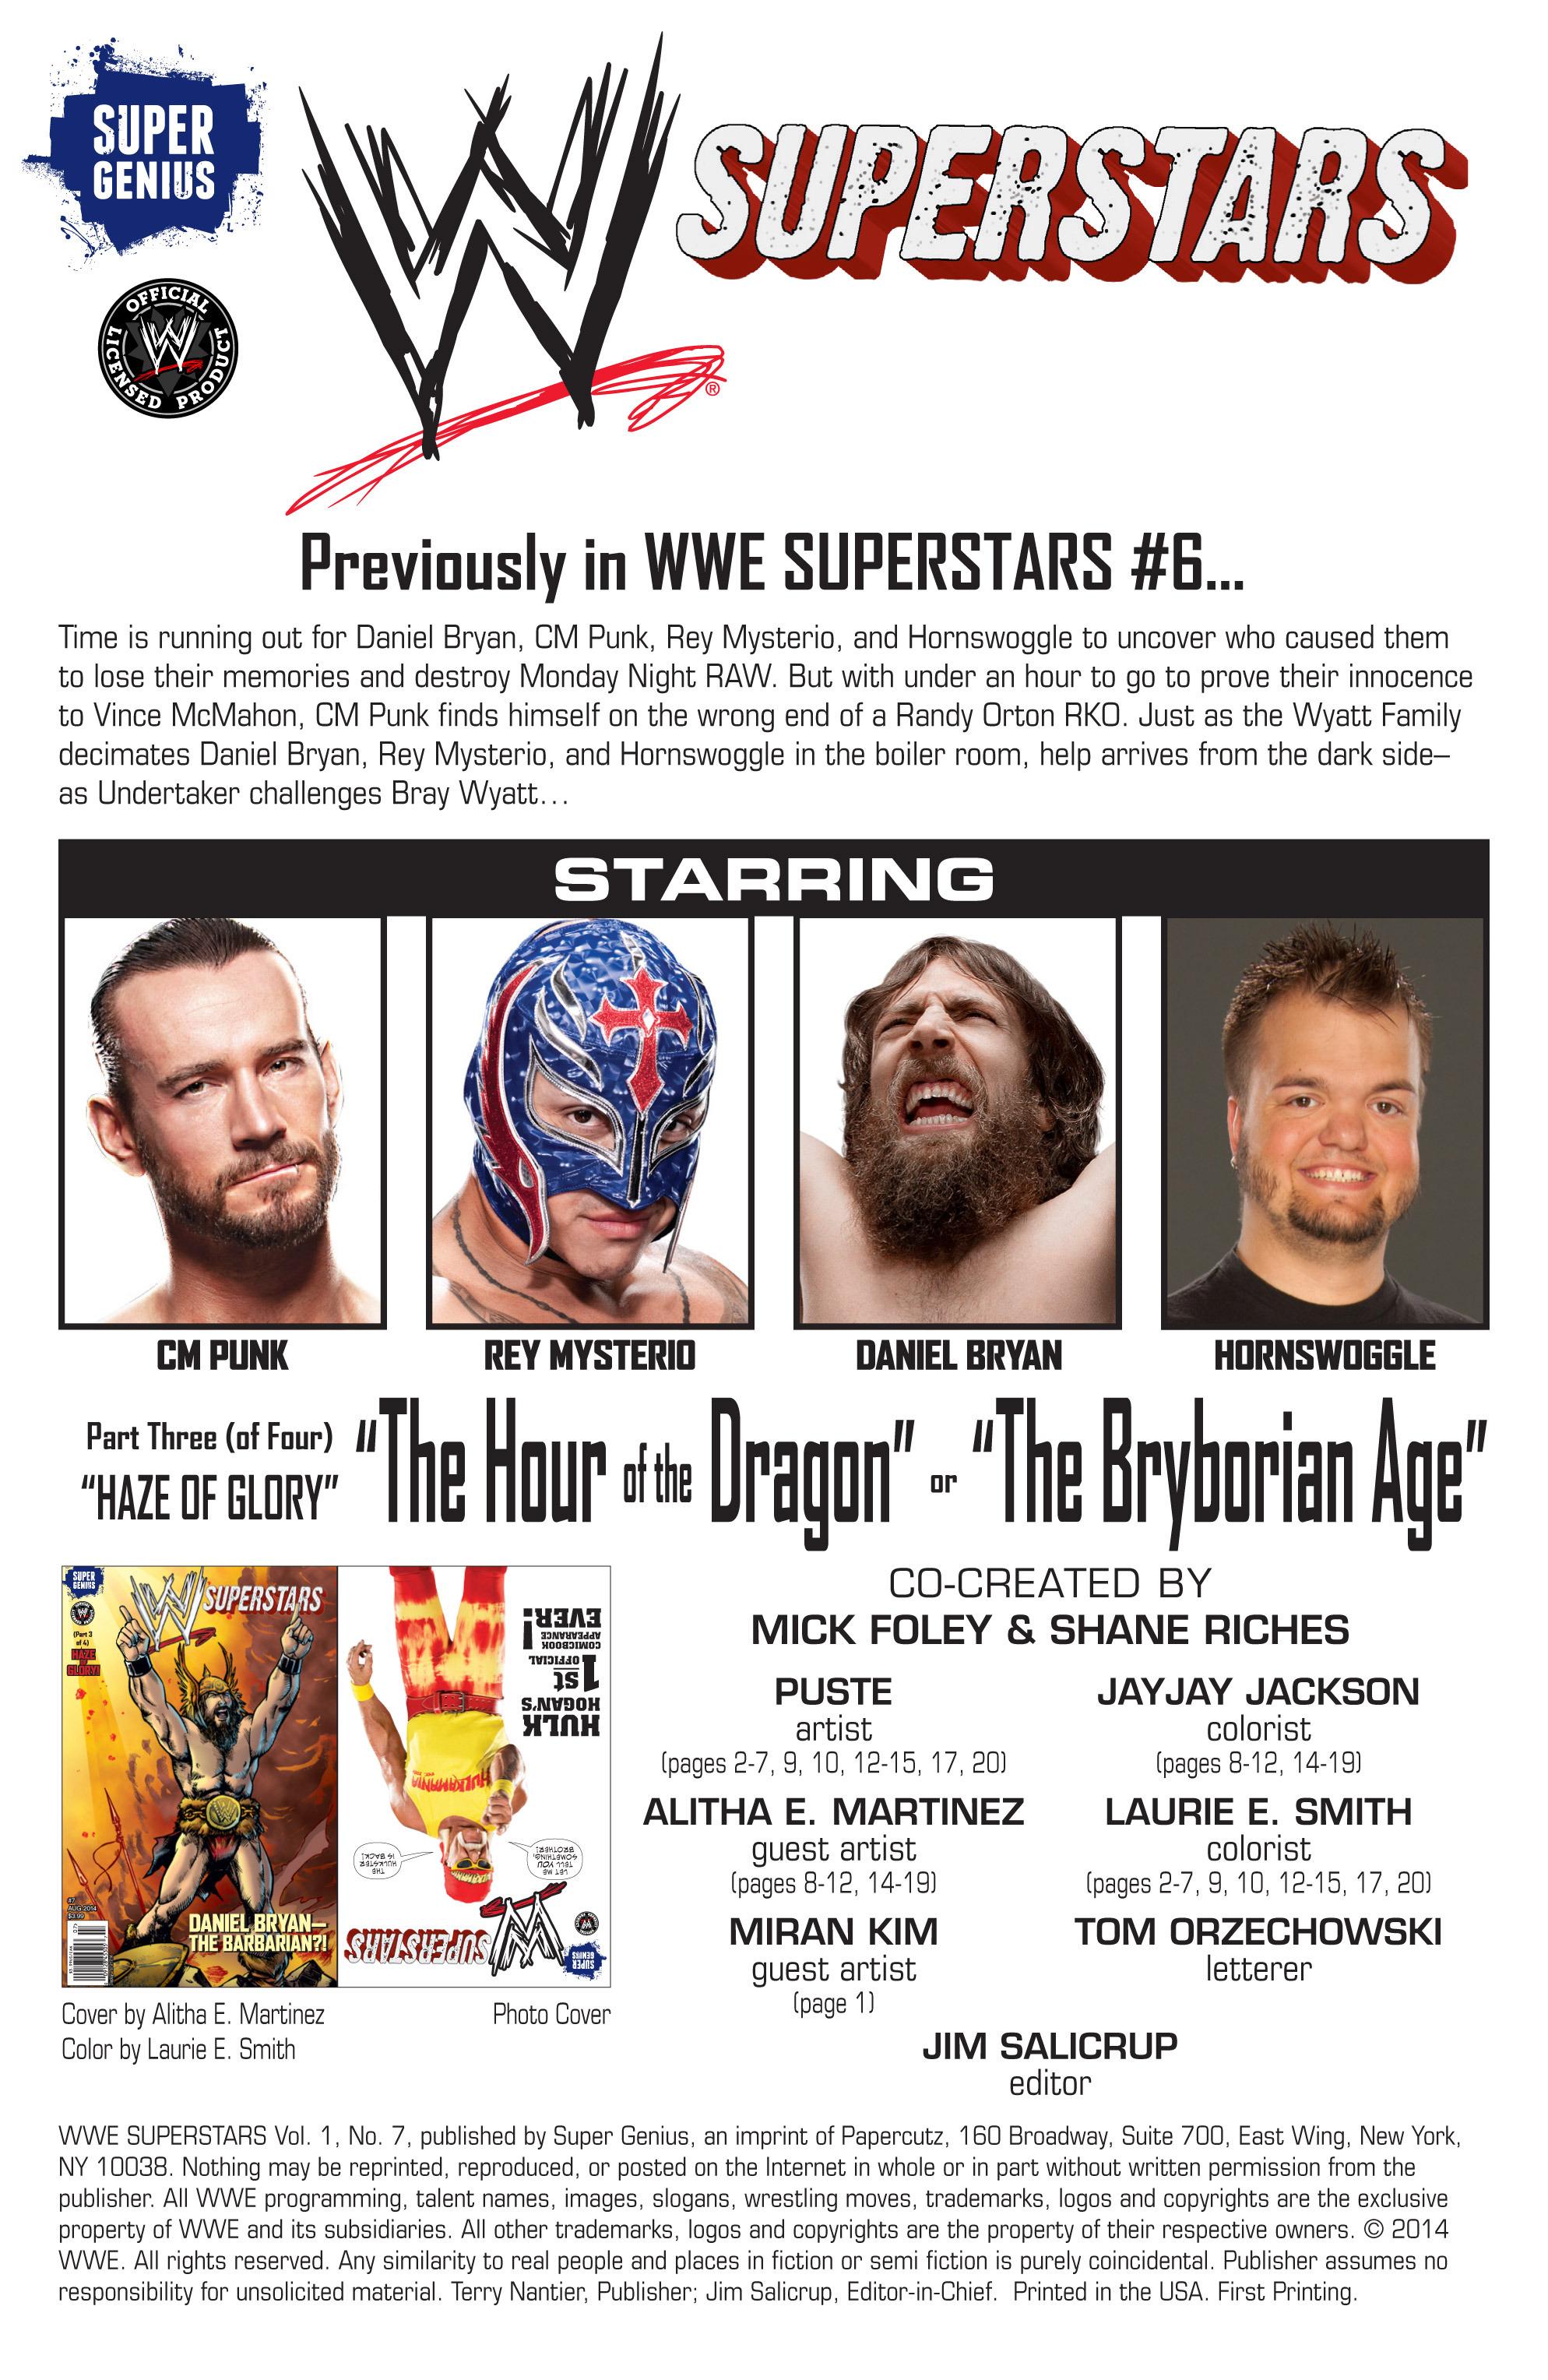 Read online WWE Superstars comic -  Issue #7 - 2